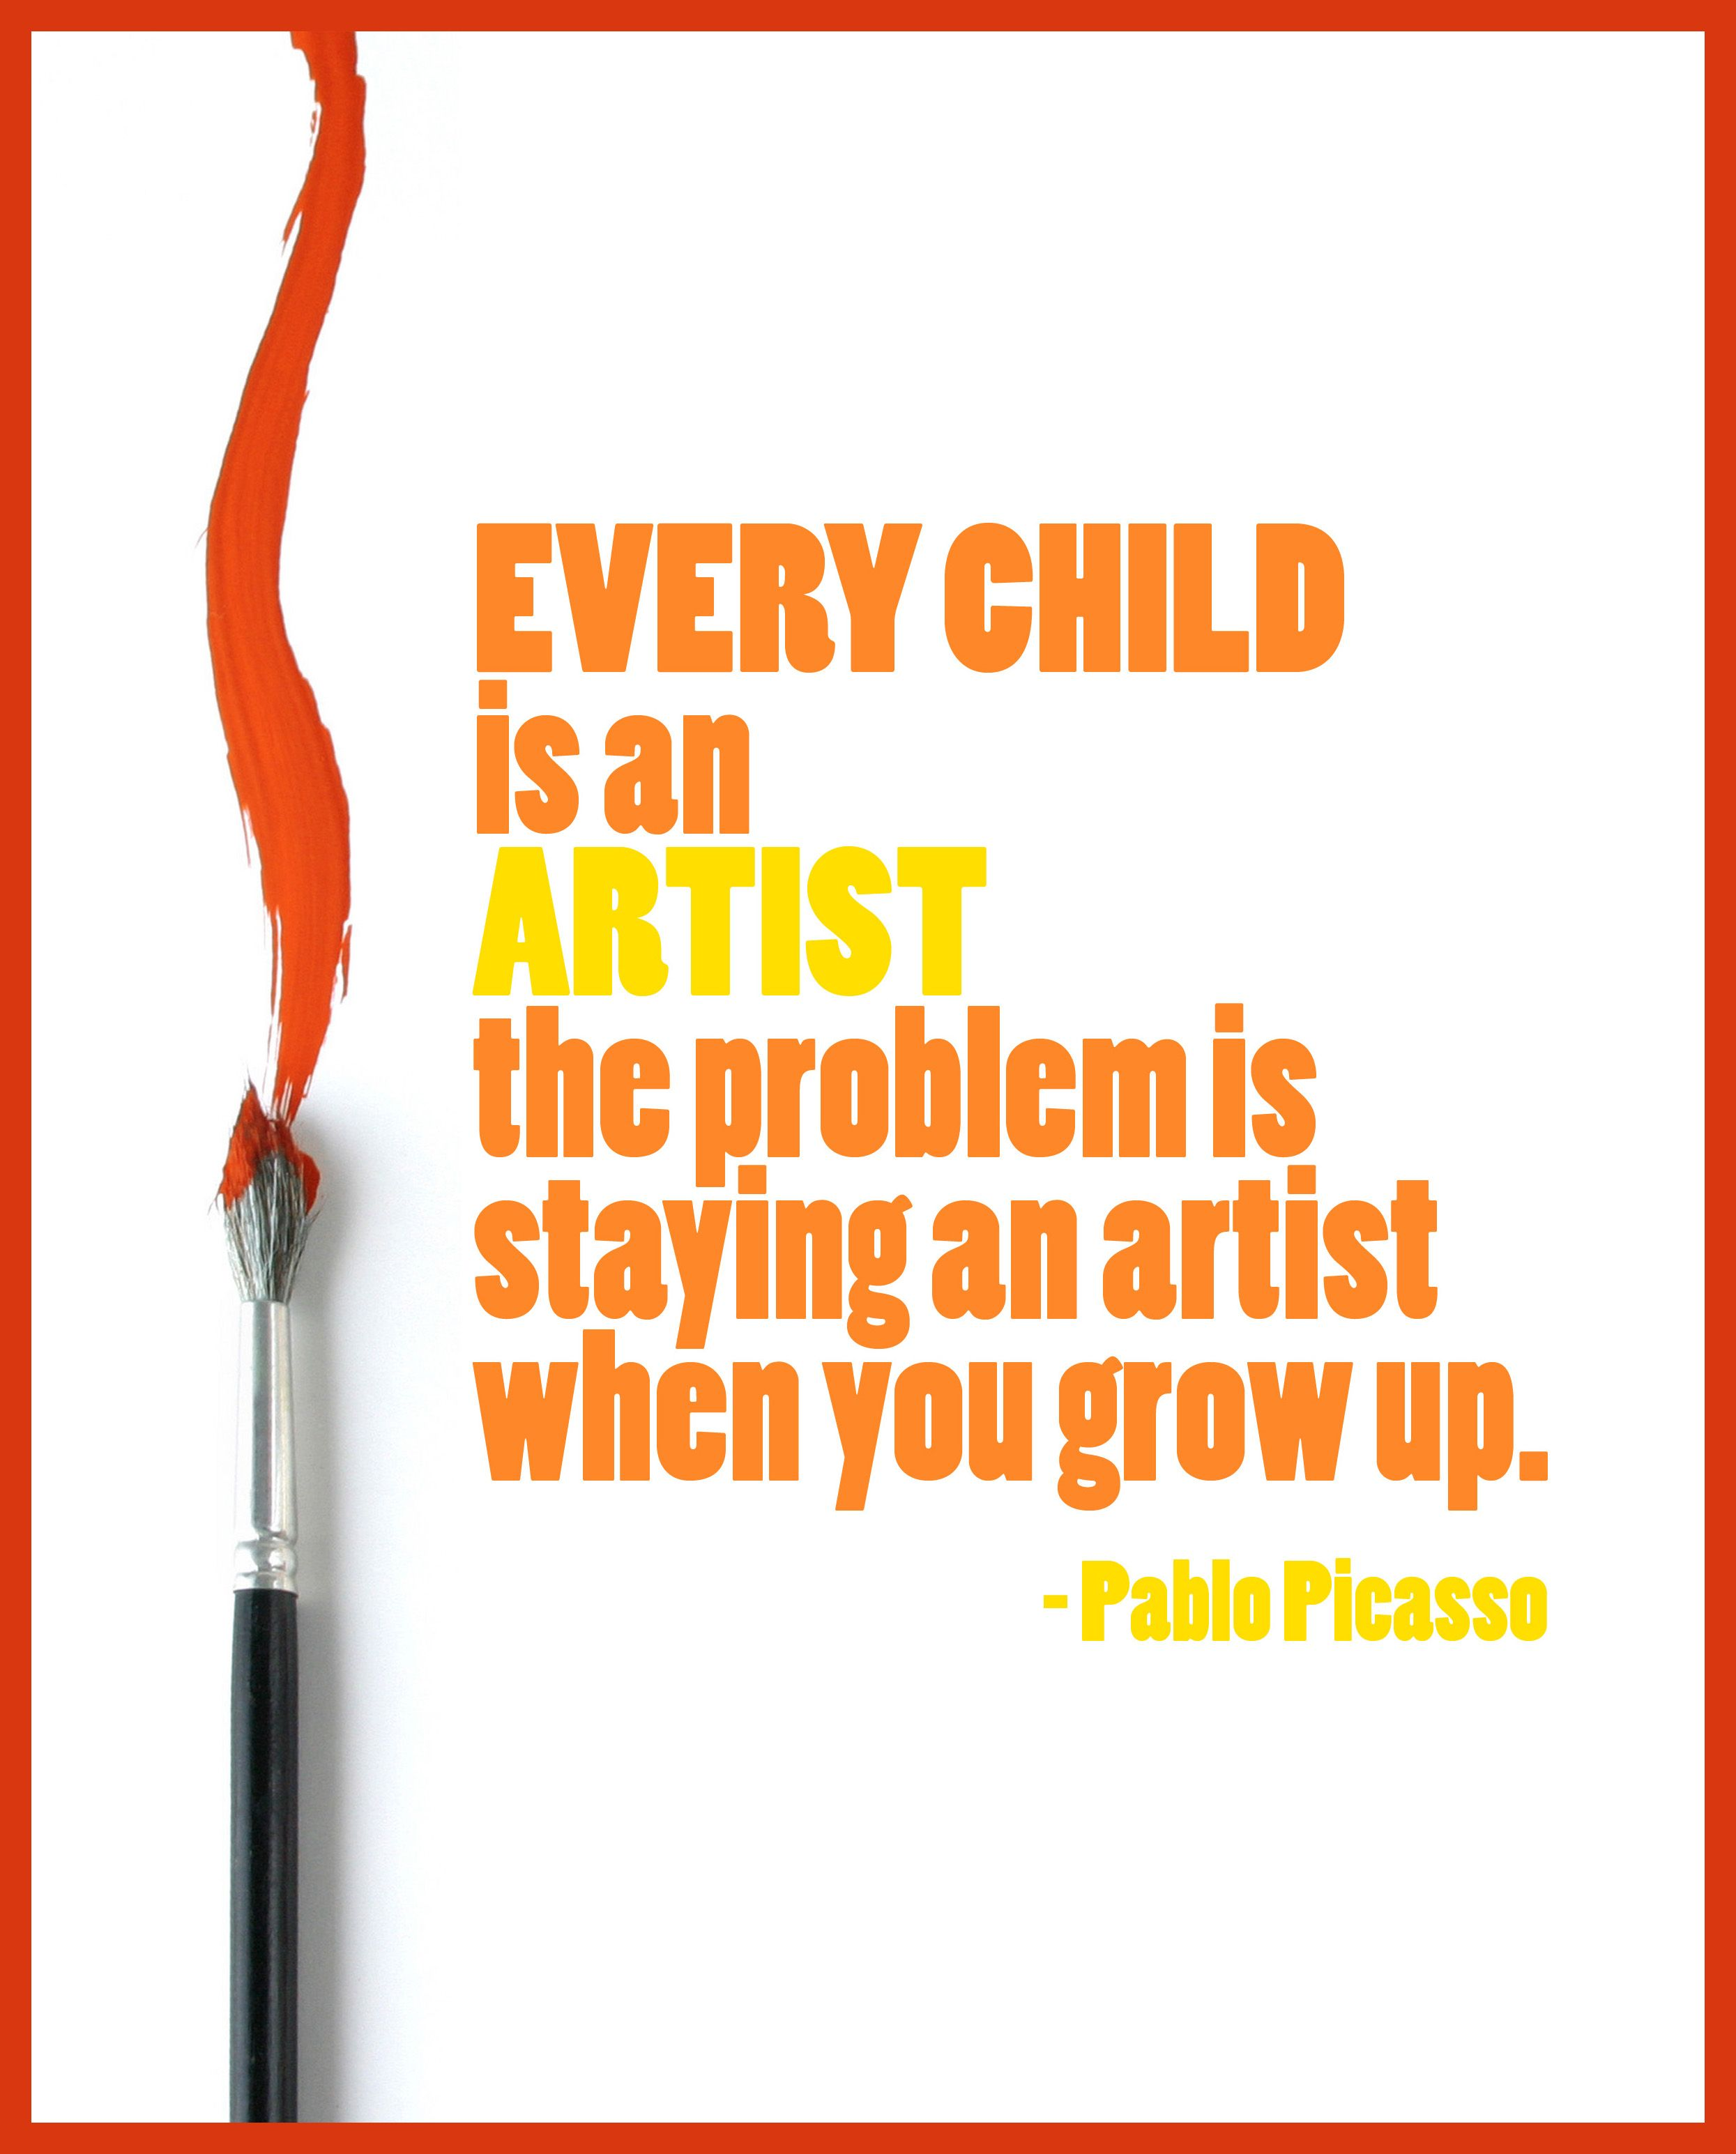 Pablo Picasso Freebies